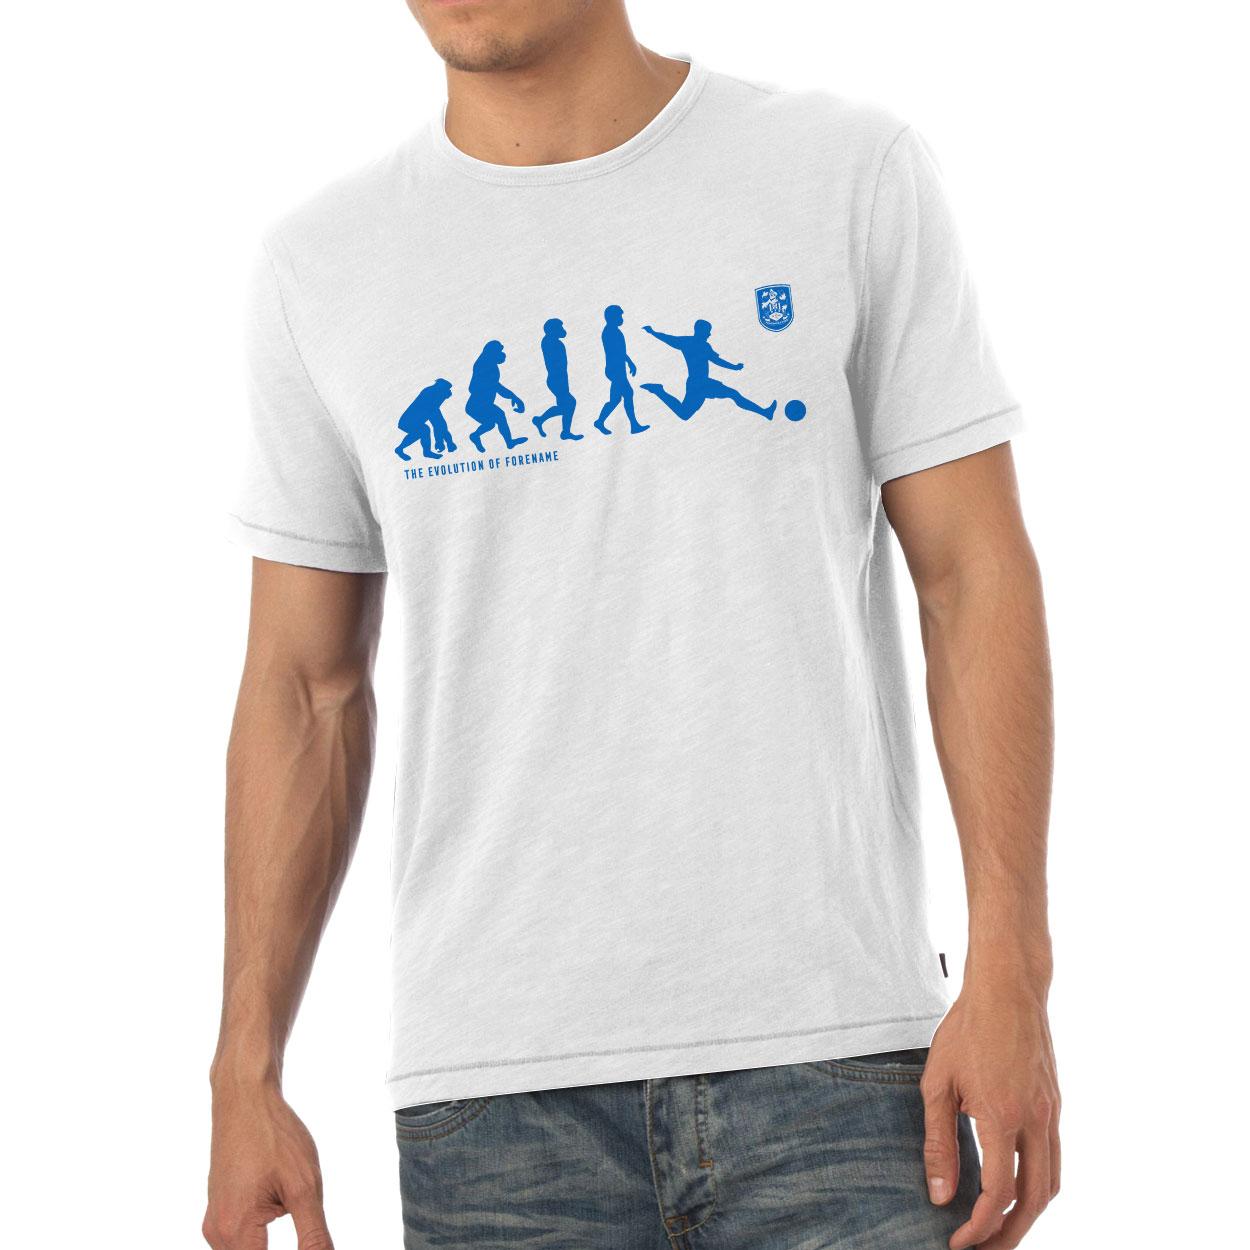 Huddersfield Town Evolution Mens T-Shirt